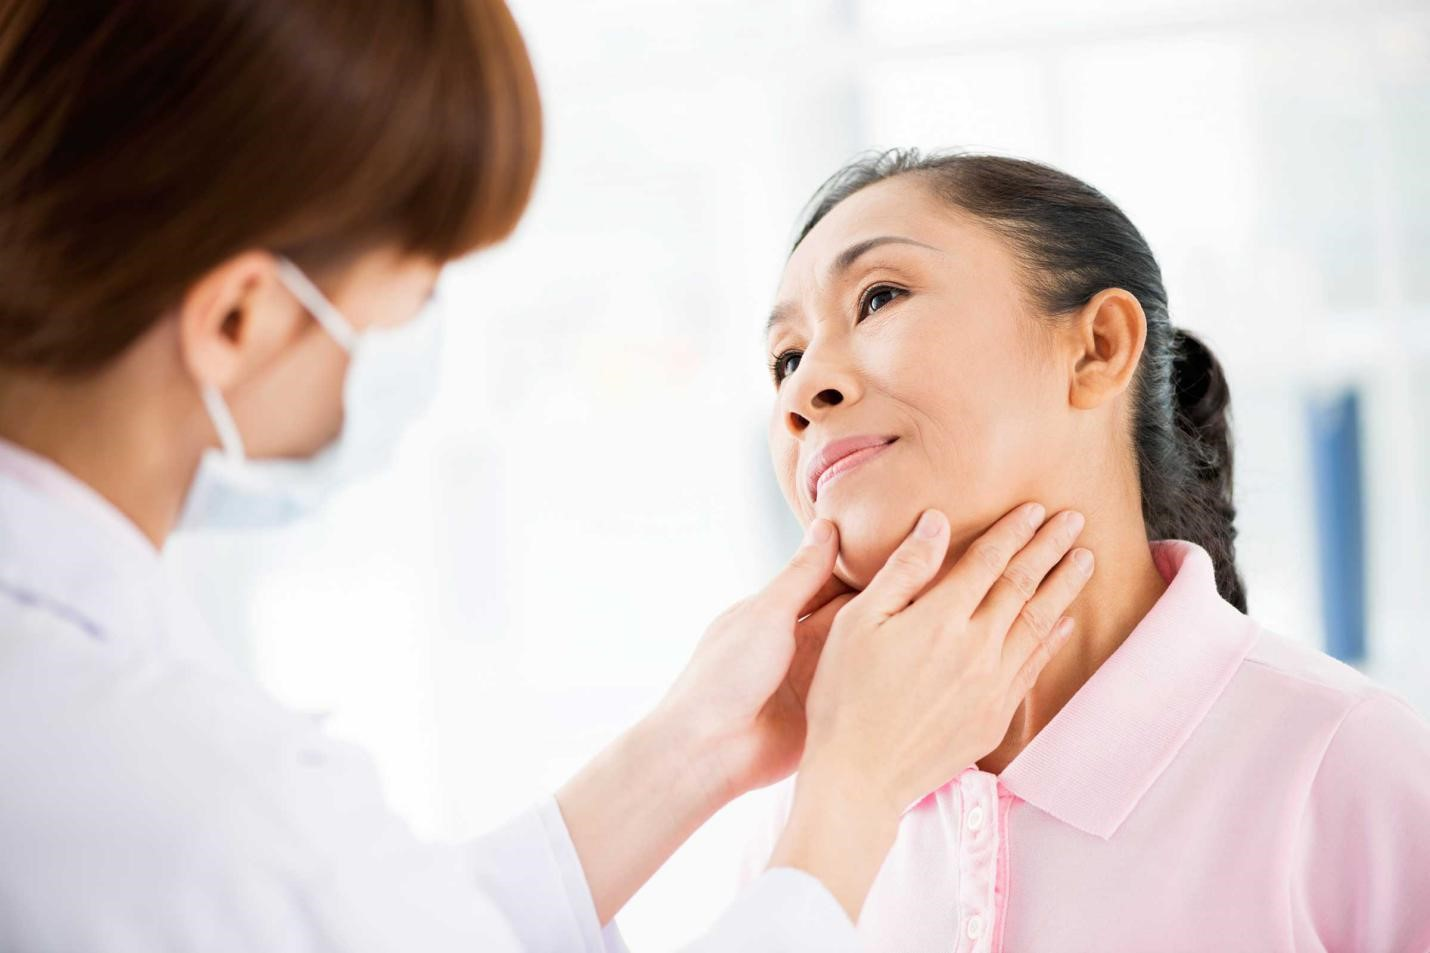 Ibu Hamil Rentan Terkena Penyakit Gondok, Ini Tips Mengatasinya